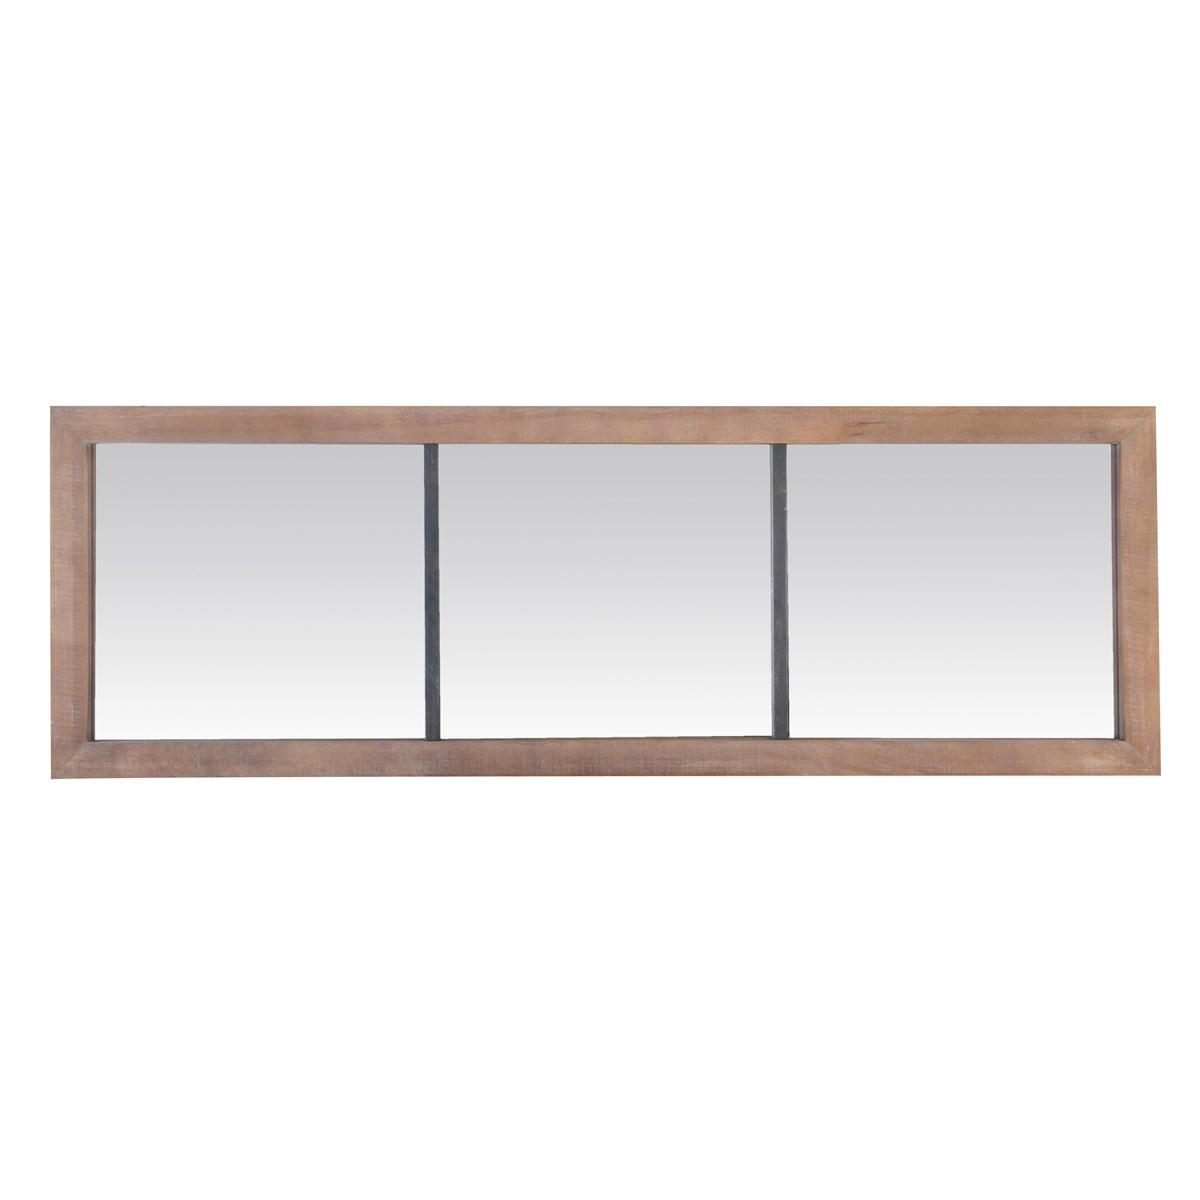 Miroir 3 bandes en métal et bois marron 150x50